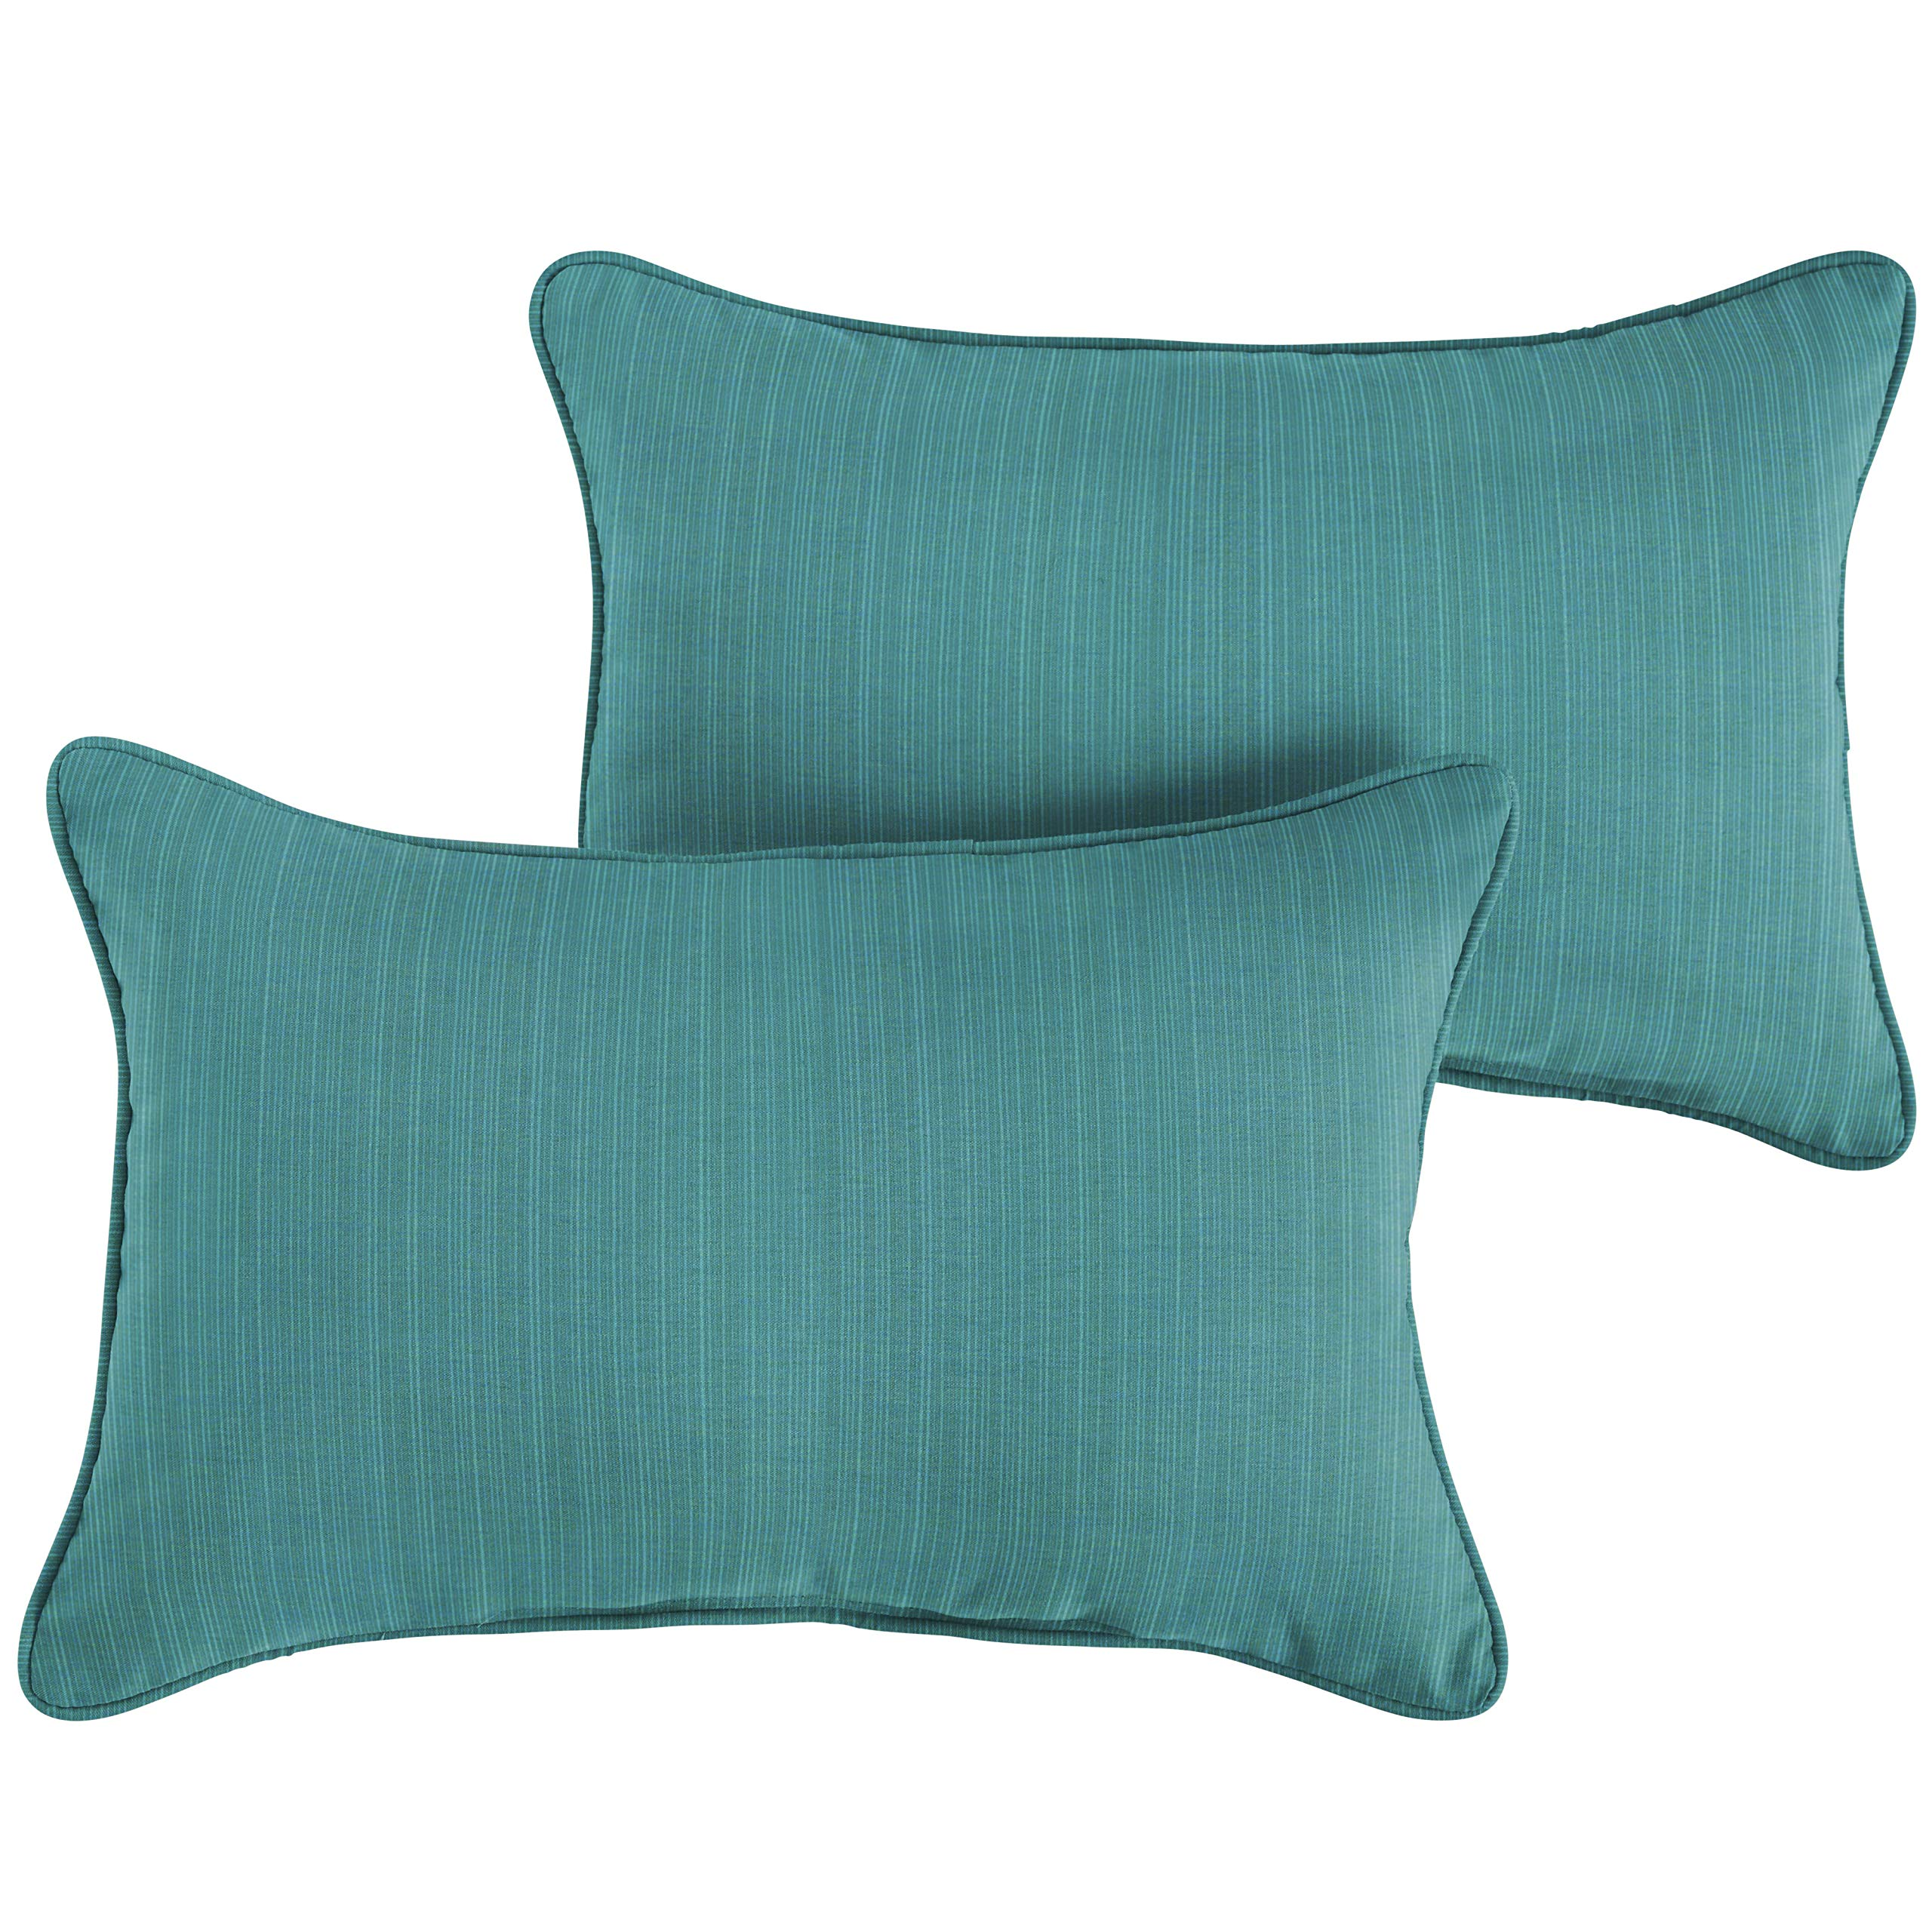 1101Design Sunbrella Dupione Deep Sea Corded Decorative Indoor/Outdoor Lumbar Throw Pillows, Perfect Patio Décor - Textured Sea Blue 12''x18'' (Set of 2)